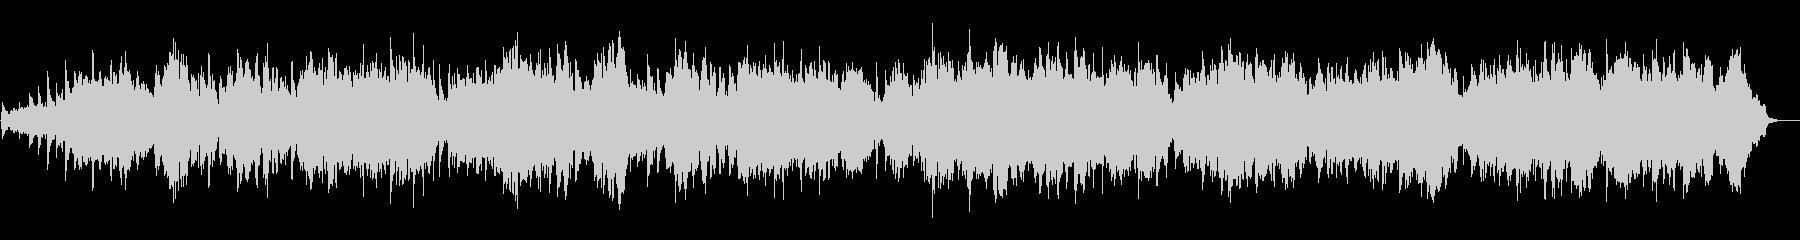 G線上のアリア(ストリングス)の未再生の波形